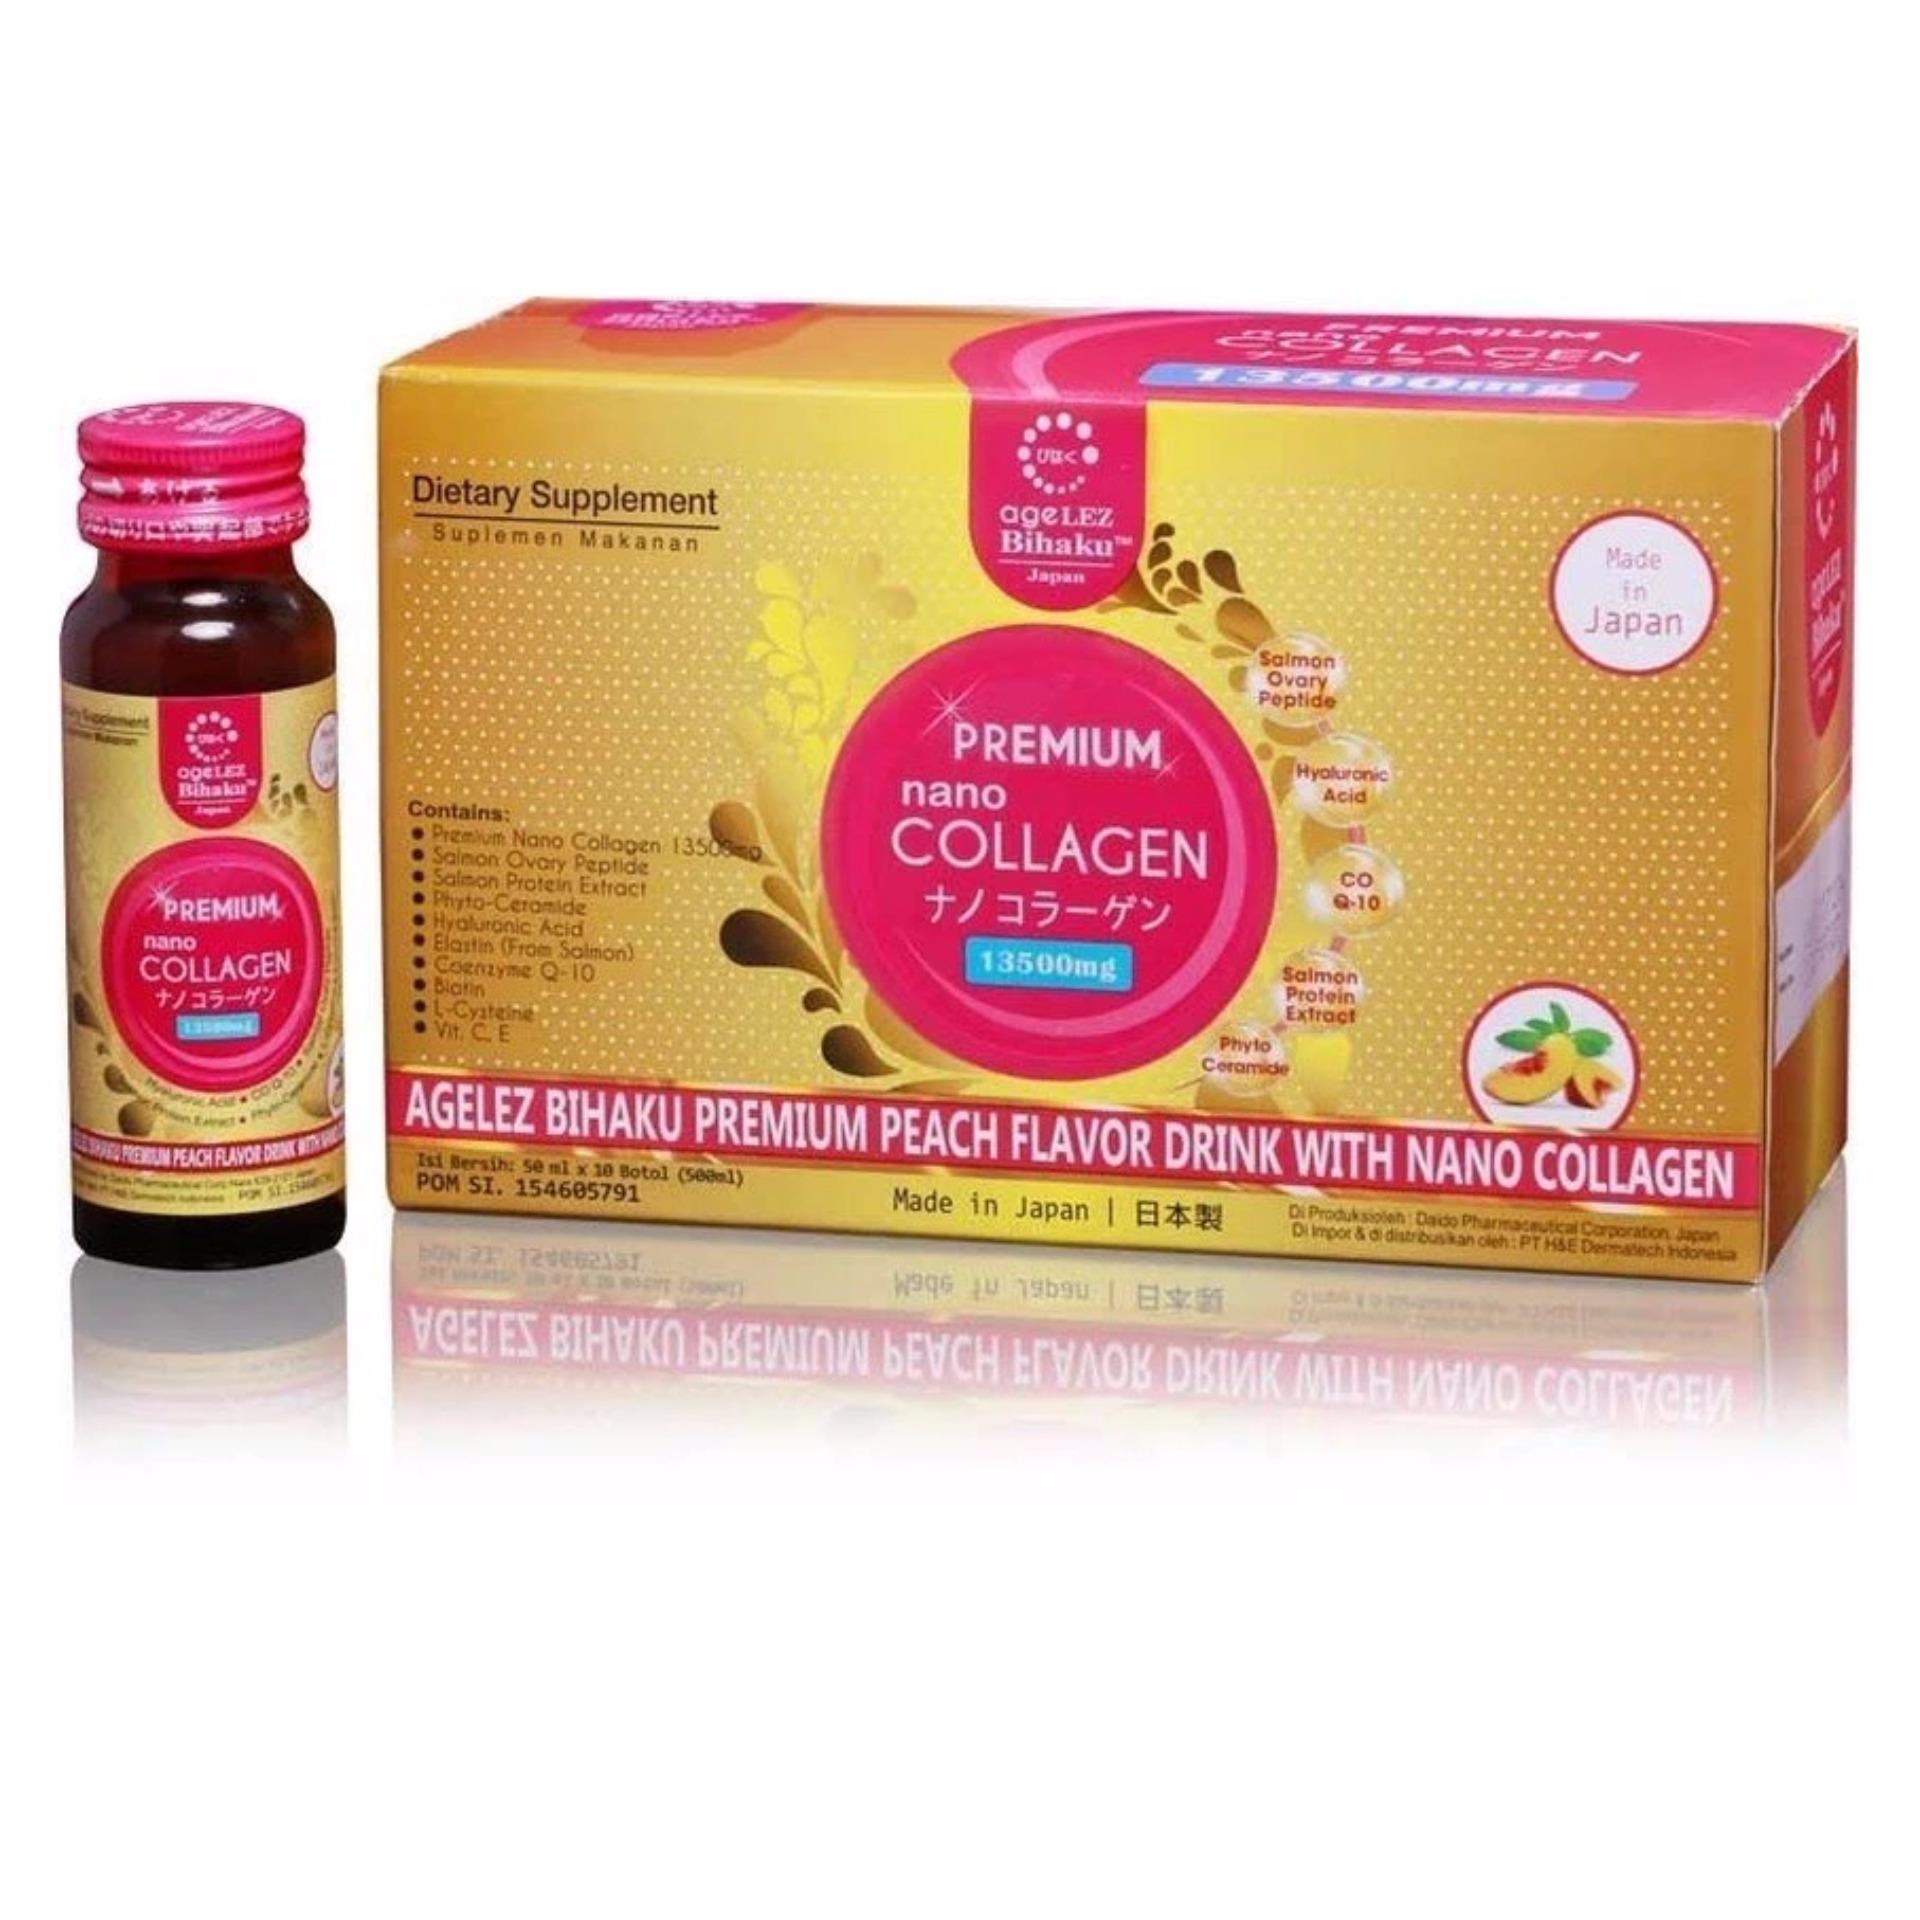 Beli Barang Agelez Bihaku Premium Nano Collagen 13 500Mg Isi 10 Botol Online